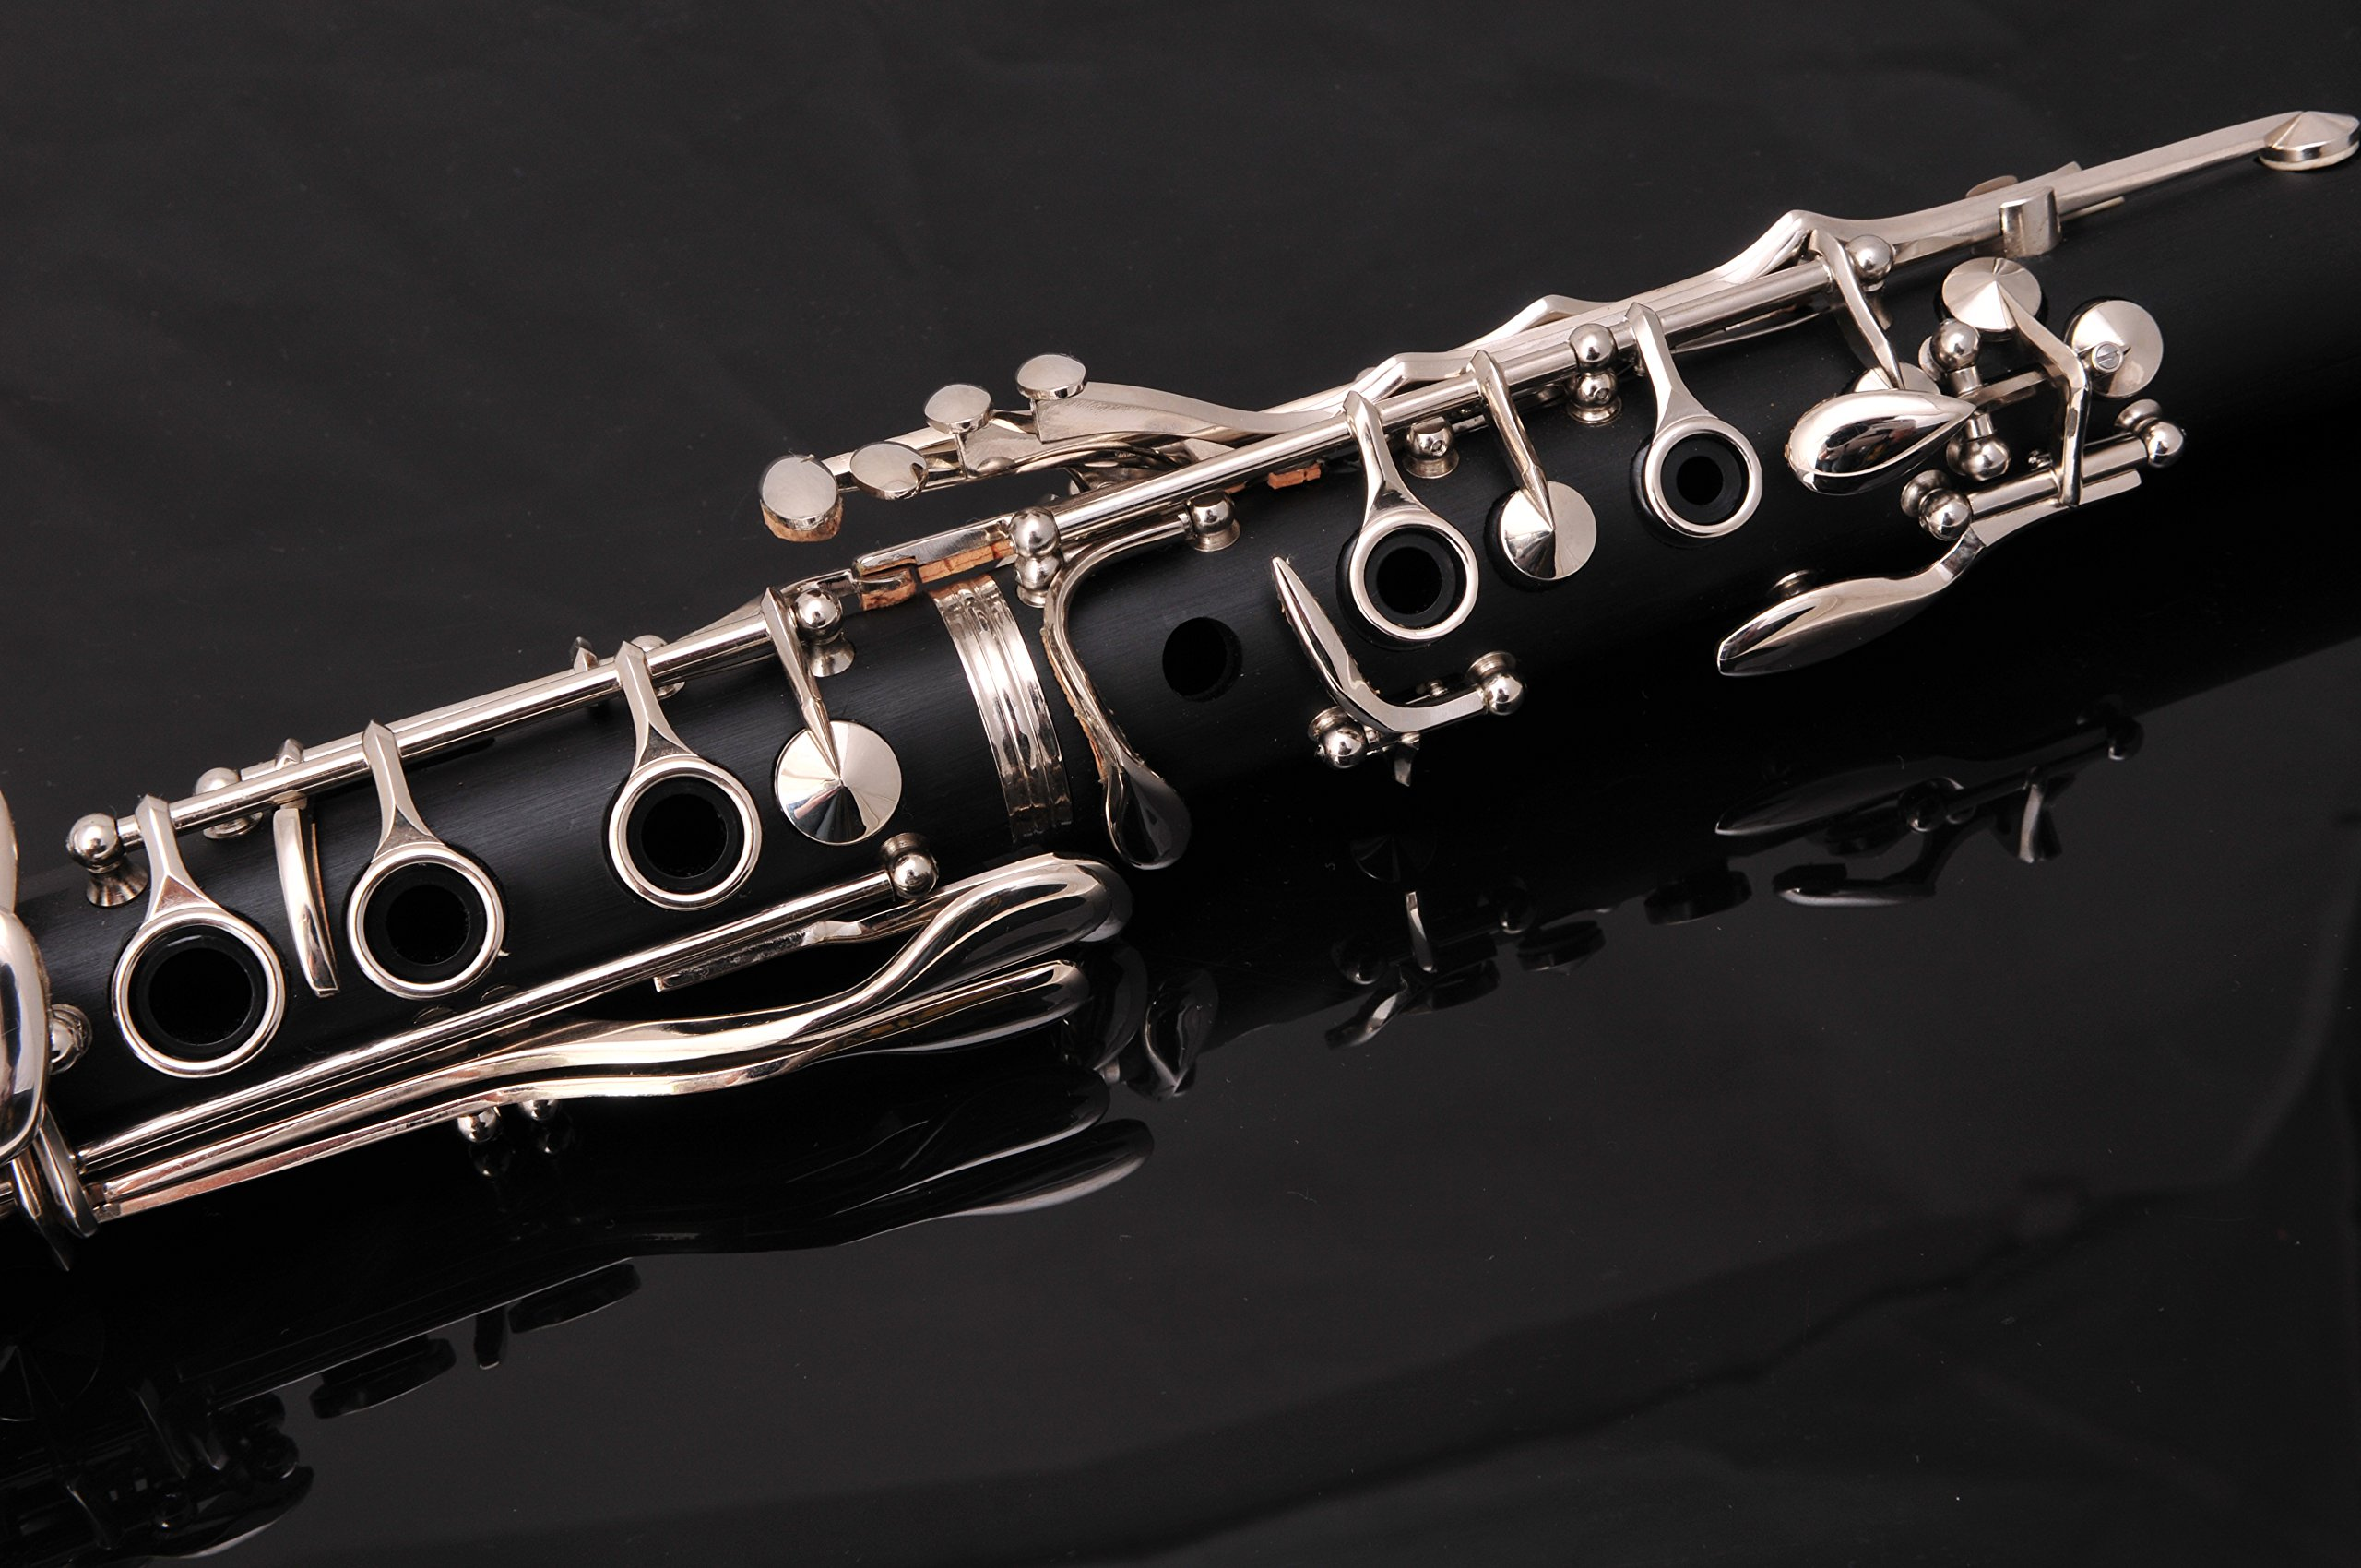 Glory B Flat Black Ebonite Clarinet with 2 Barrels 11reeds,8 Pads...